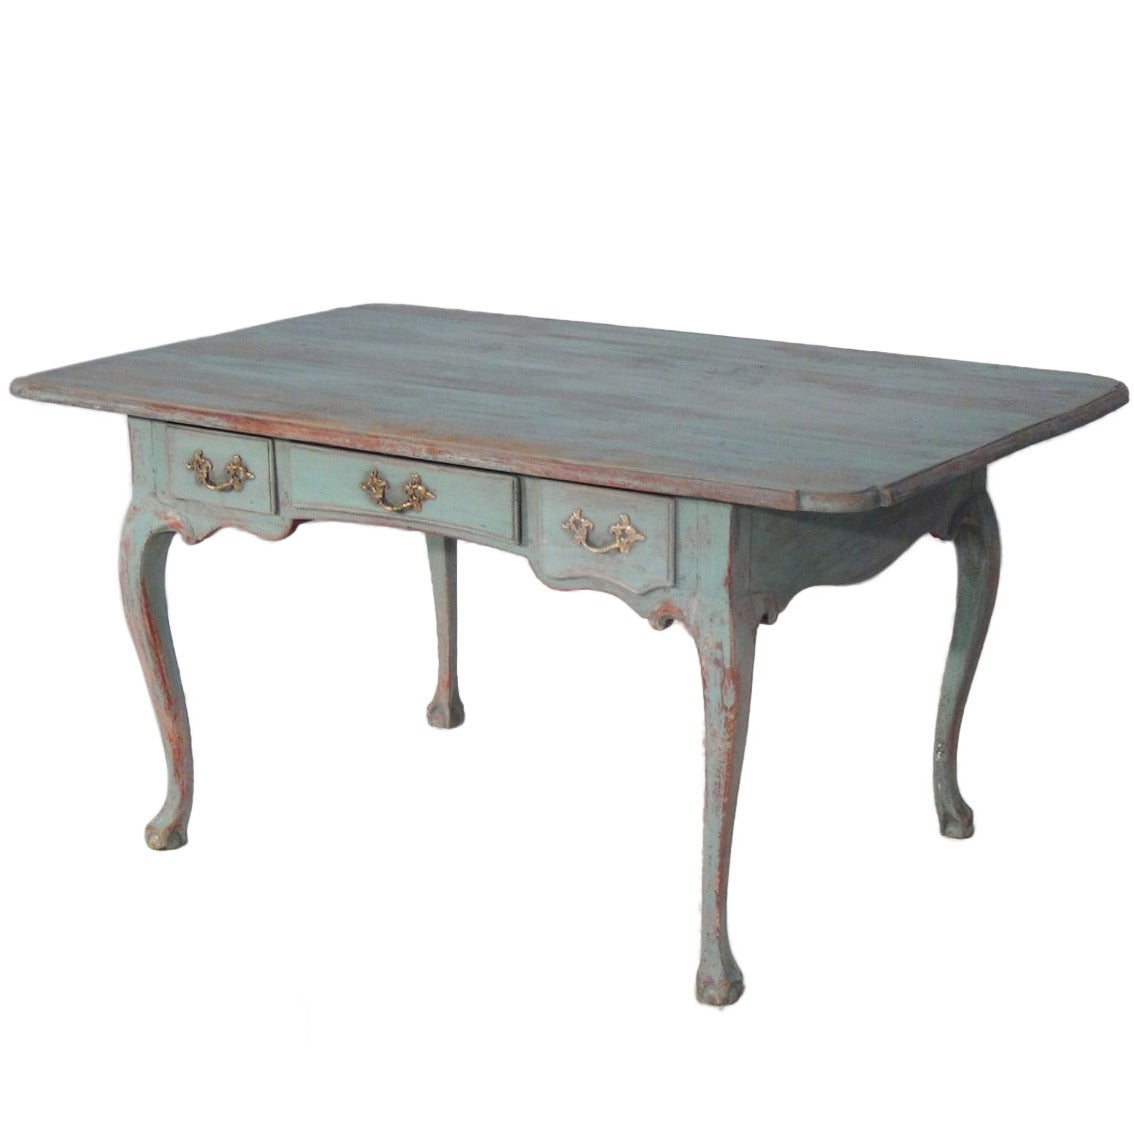 19th Century Swedish Rococo Writing Desk in Original Paint at 1stdibs